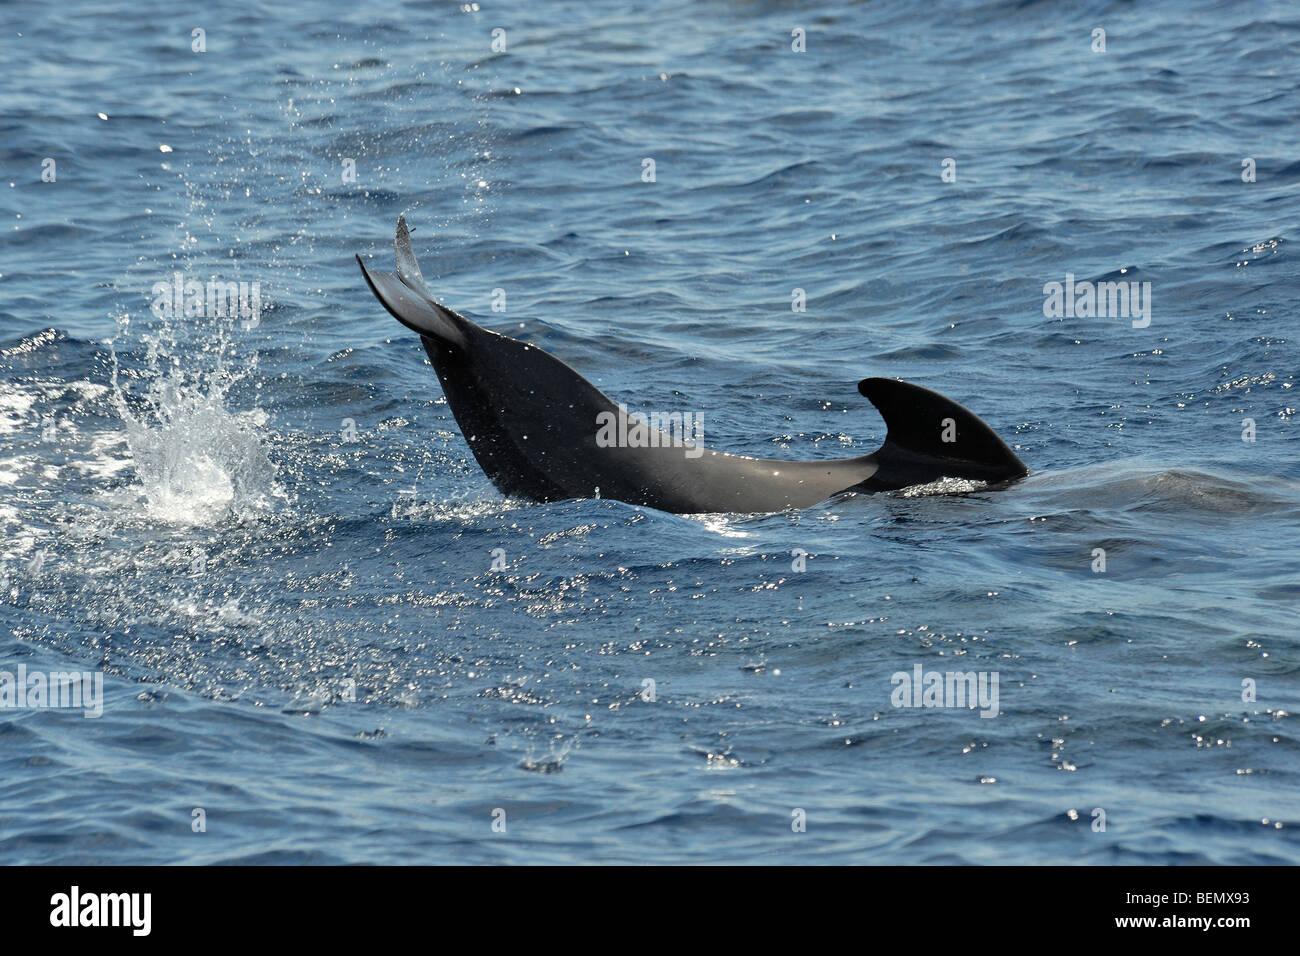 Short-finned Pilot Whale, Globicephala macrorhynchus, lobtailing, south of Pico Island, Azores, Atlantic Ocean. - Stock Image